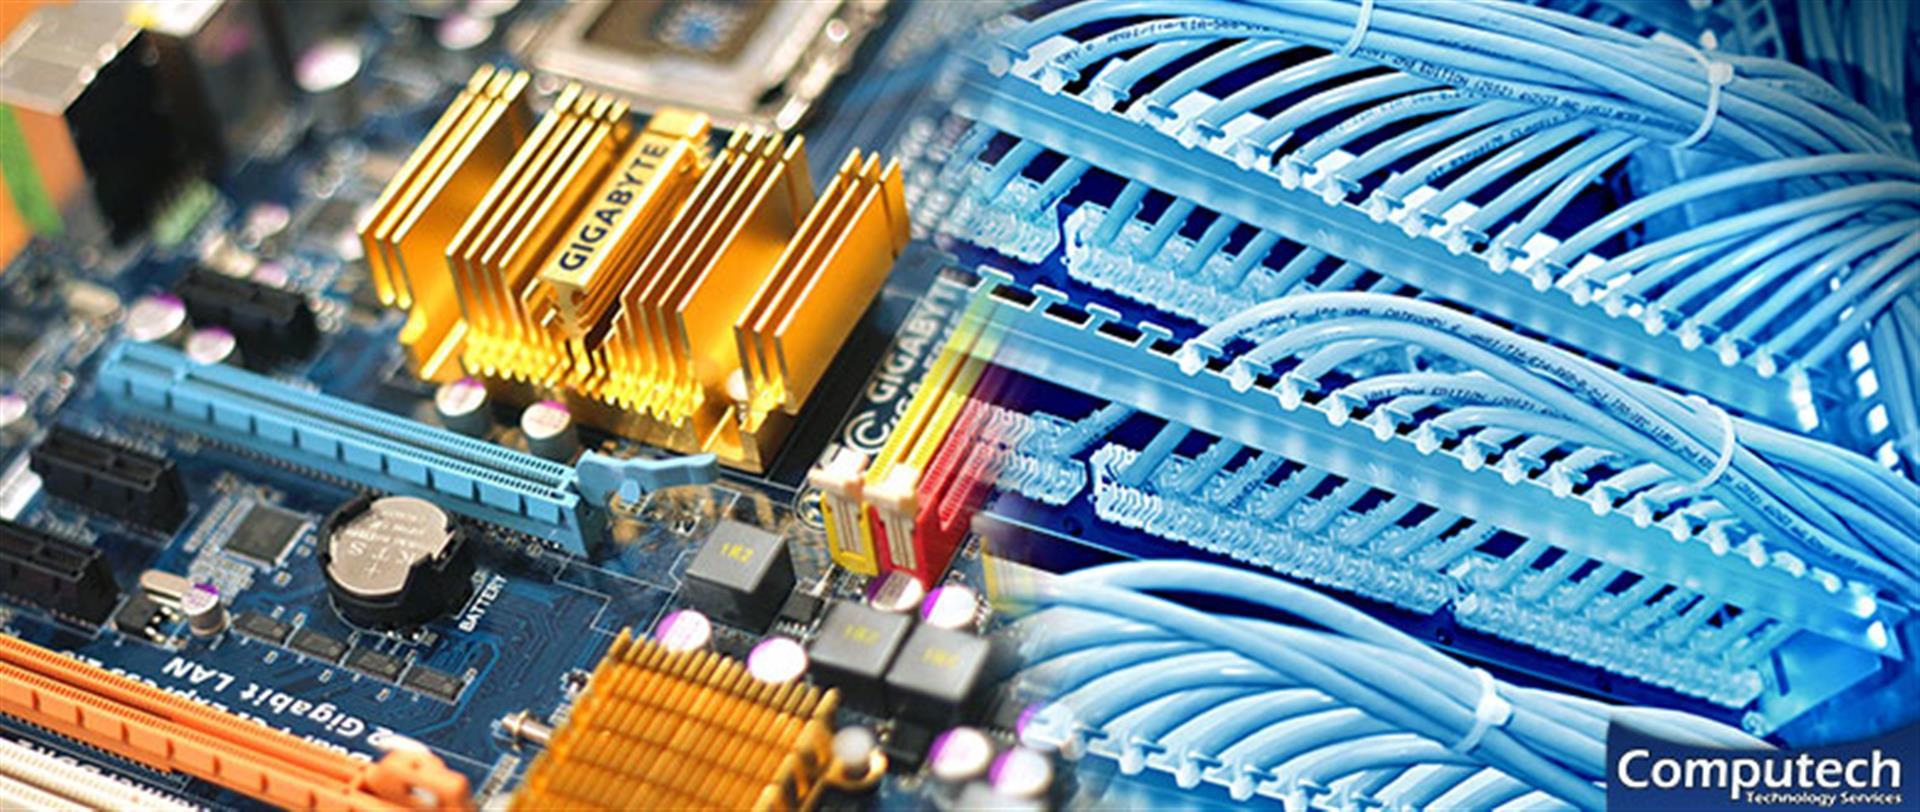 Tappahannock Virginia Onsite Computer & Printer Repair, Networking, Voice & Data Cabling Contractors